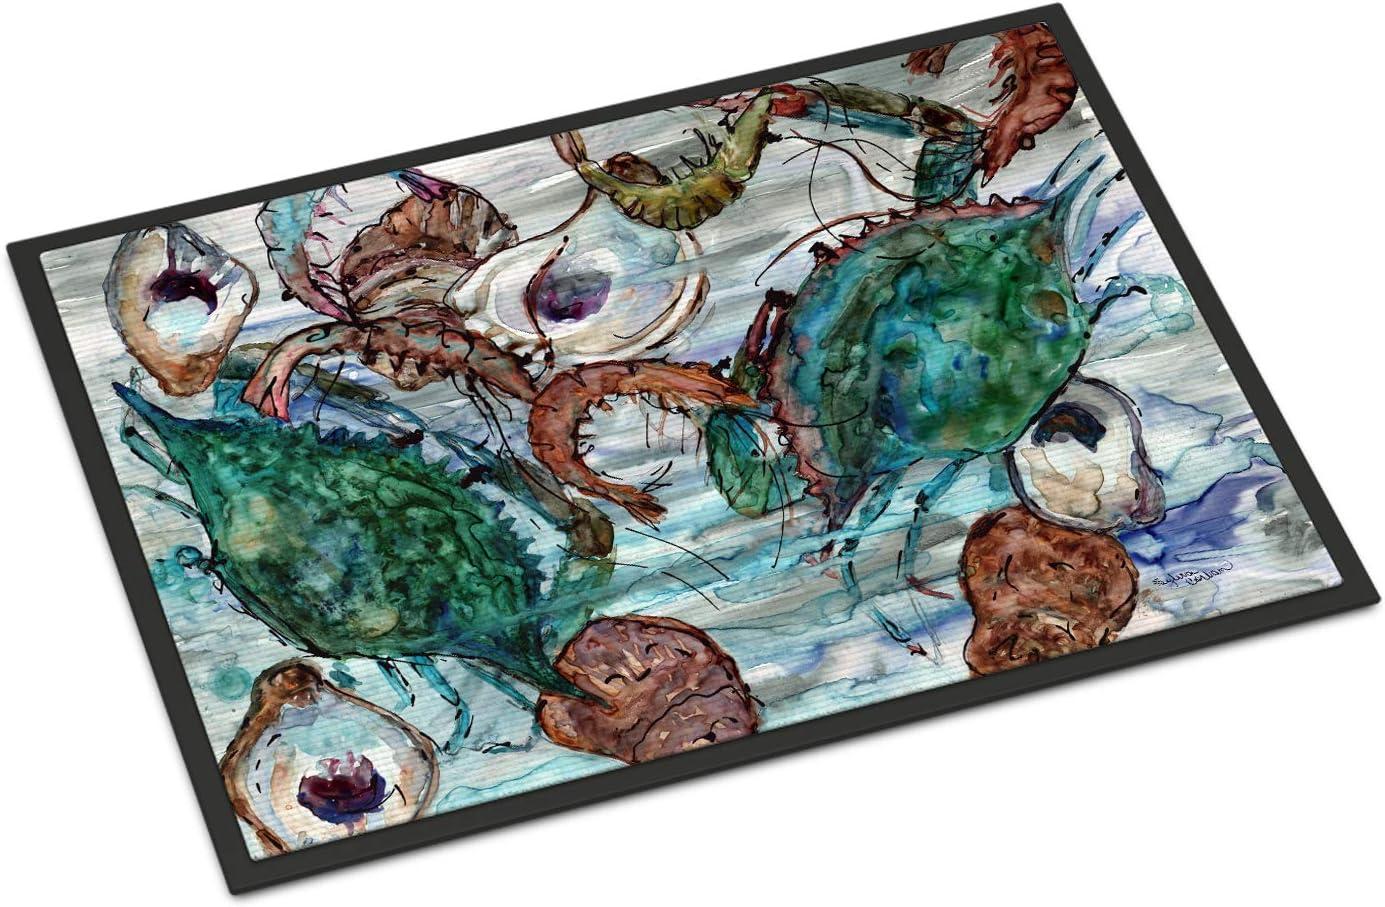 Caroline s Treasures 8965JMAT Shrimp, Crabs and Oysters in Water Indoor or Outdoor Mat 24×36, 24H X 36W, Multicolor